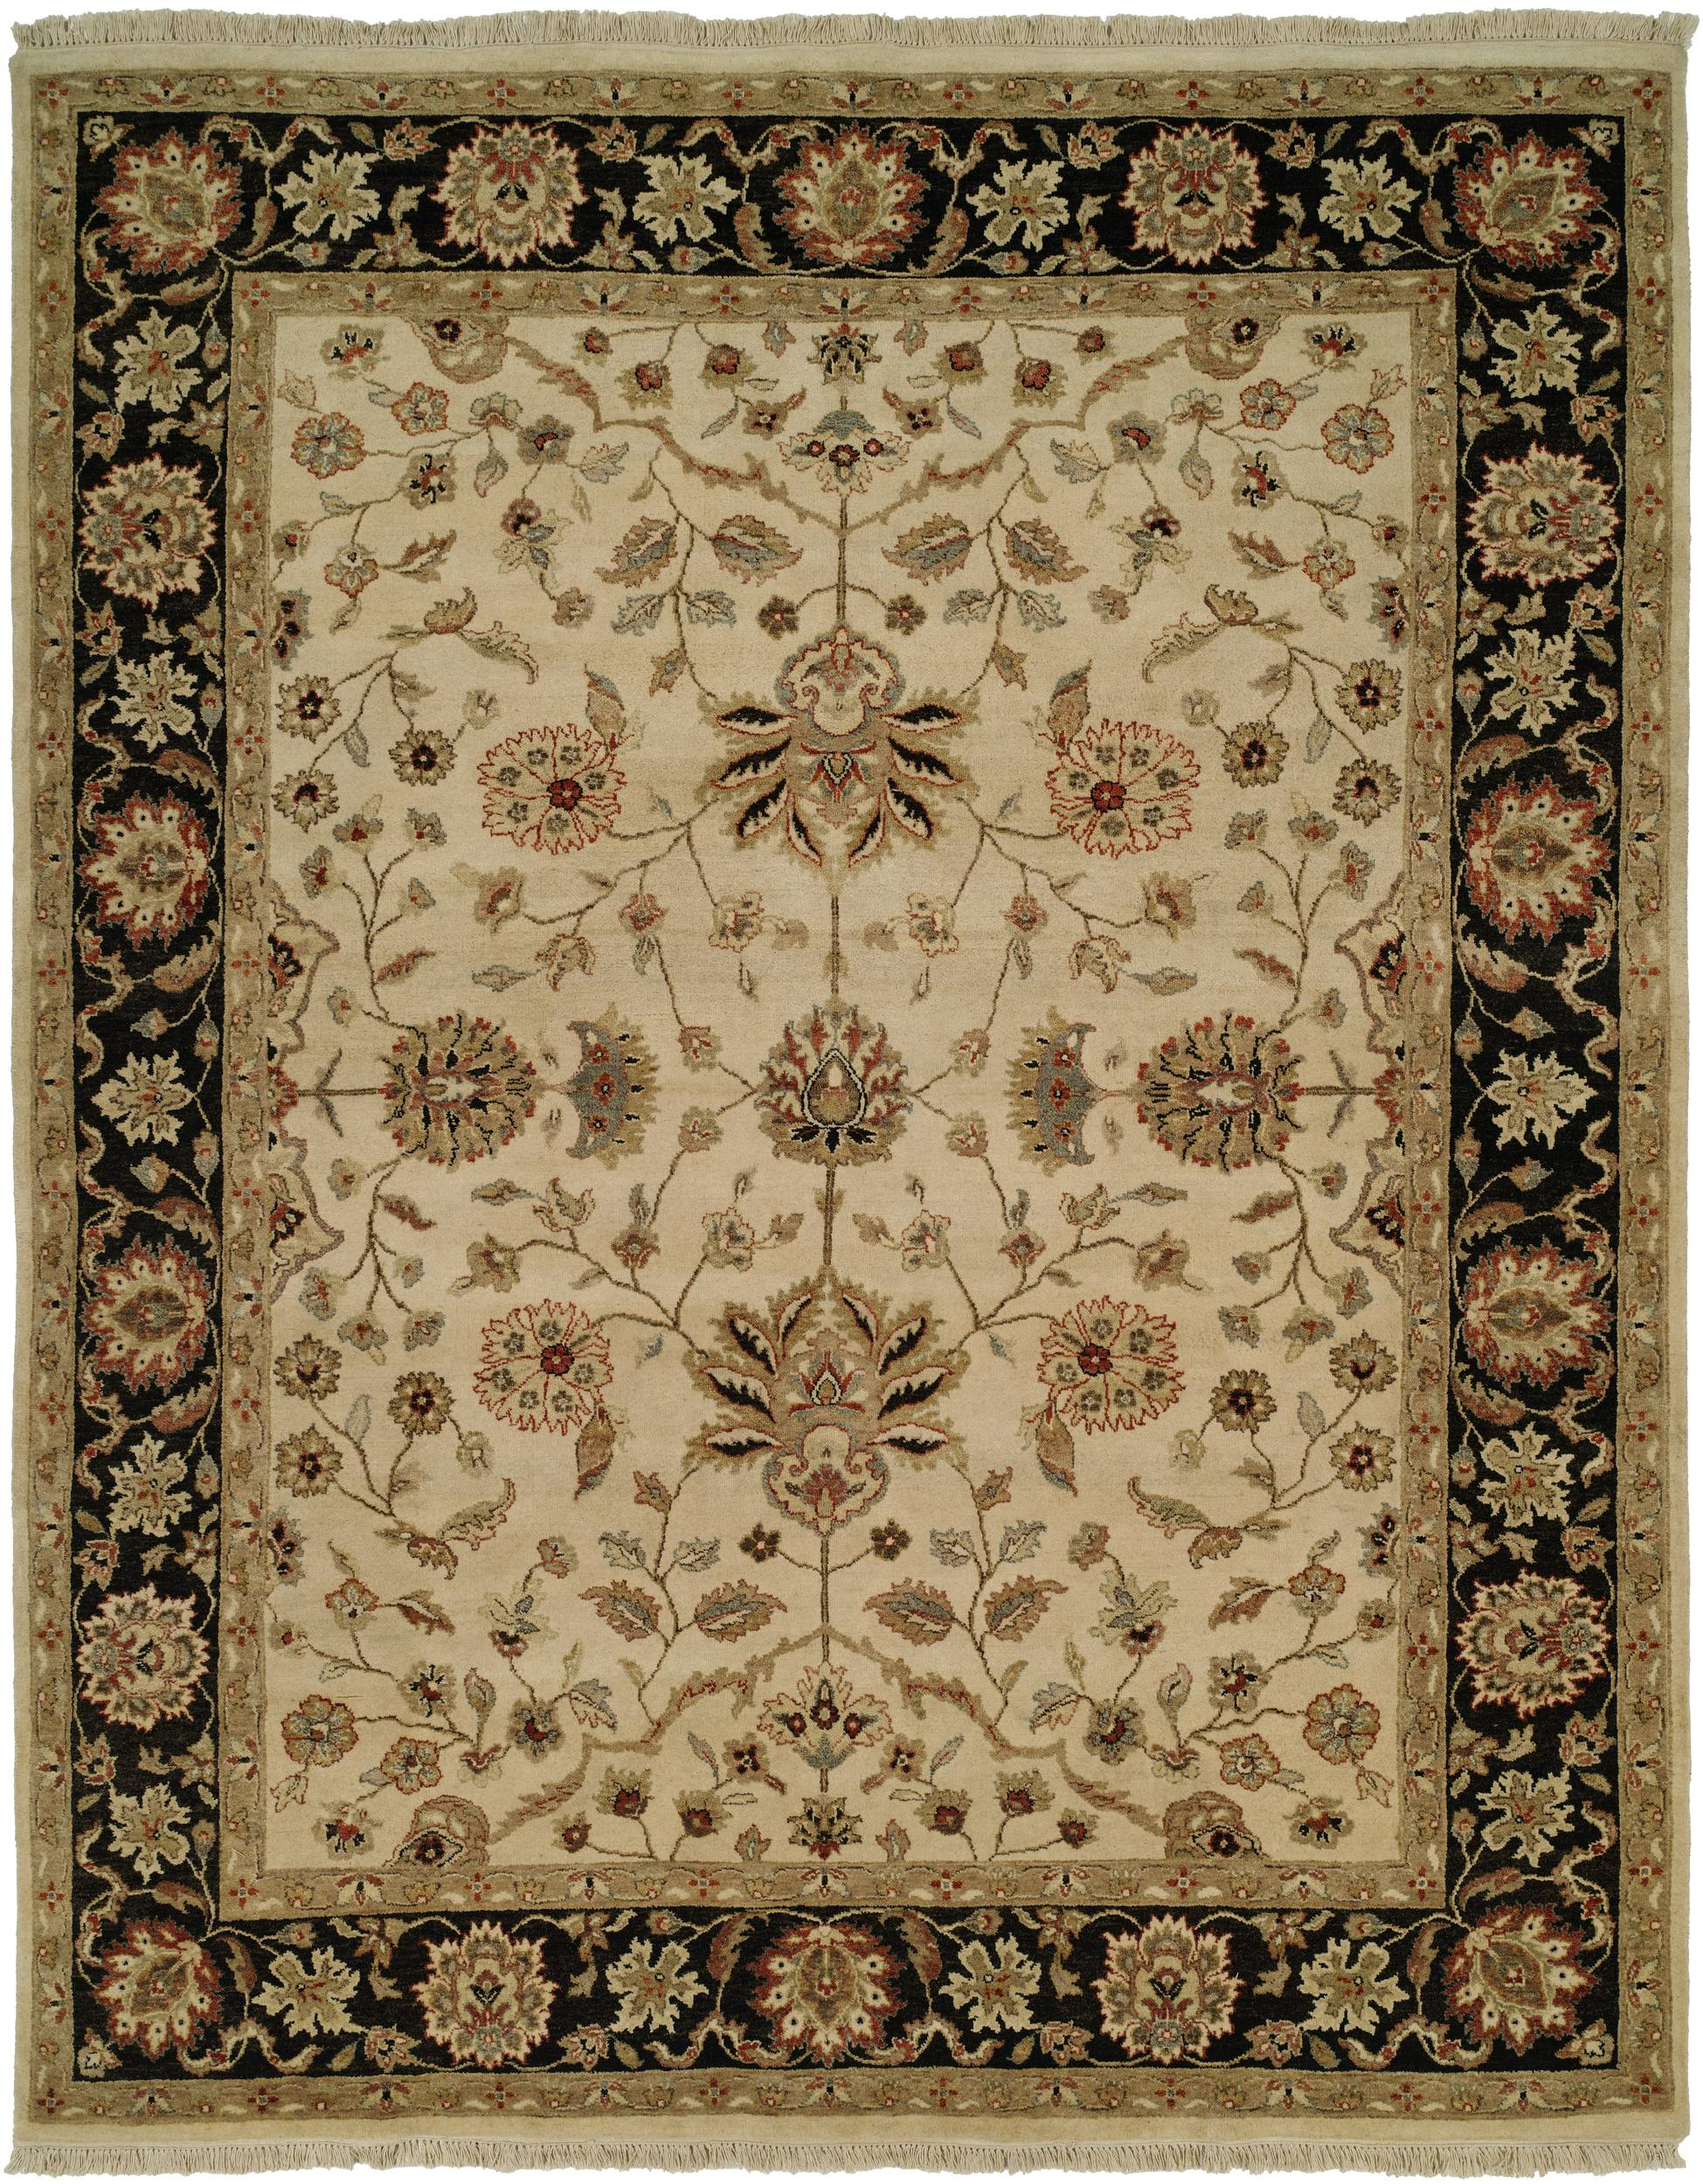 Kalaty Pasha Beige Round 9 Ft And Larger Wool Carpet 133756 Sku 133756